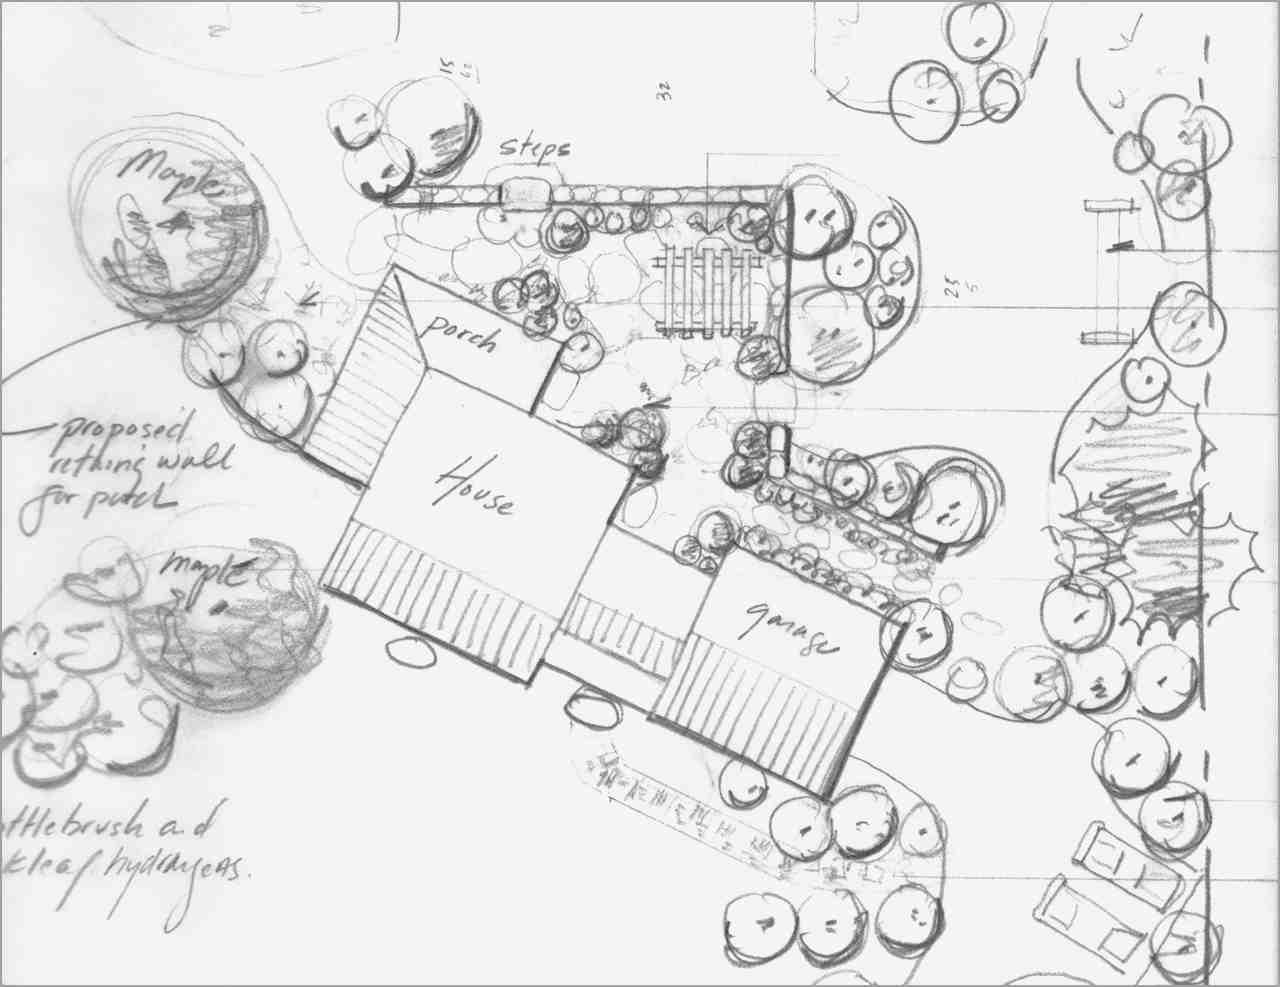 1280x987 Garden Design Construction Drawings 0041 Garden Design Plans